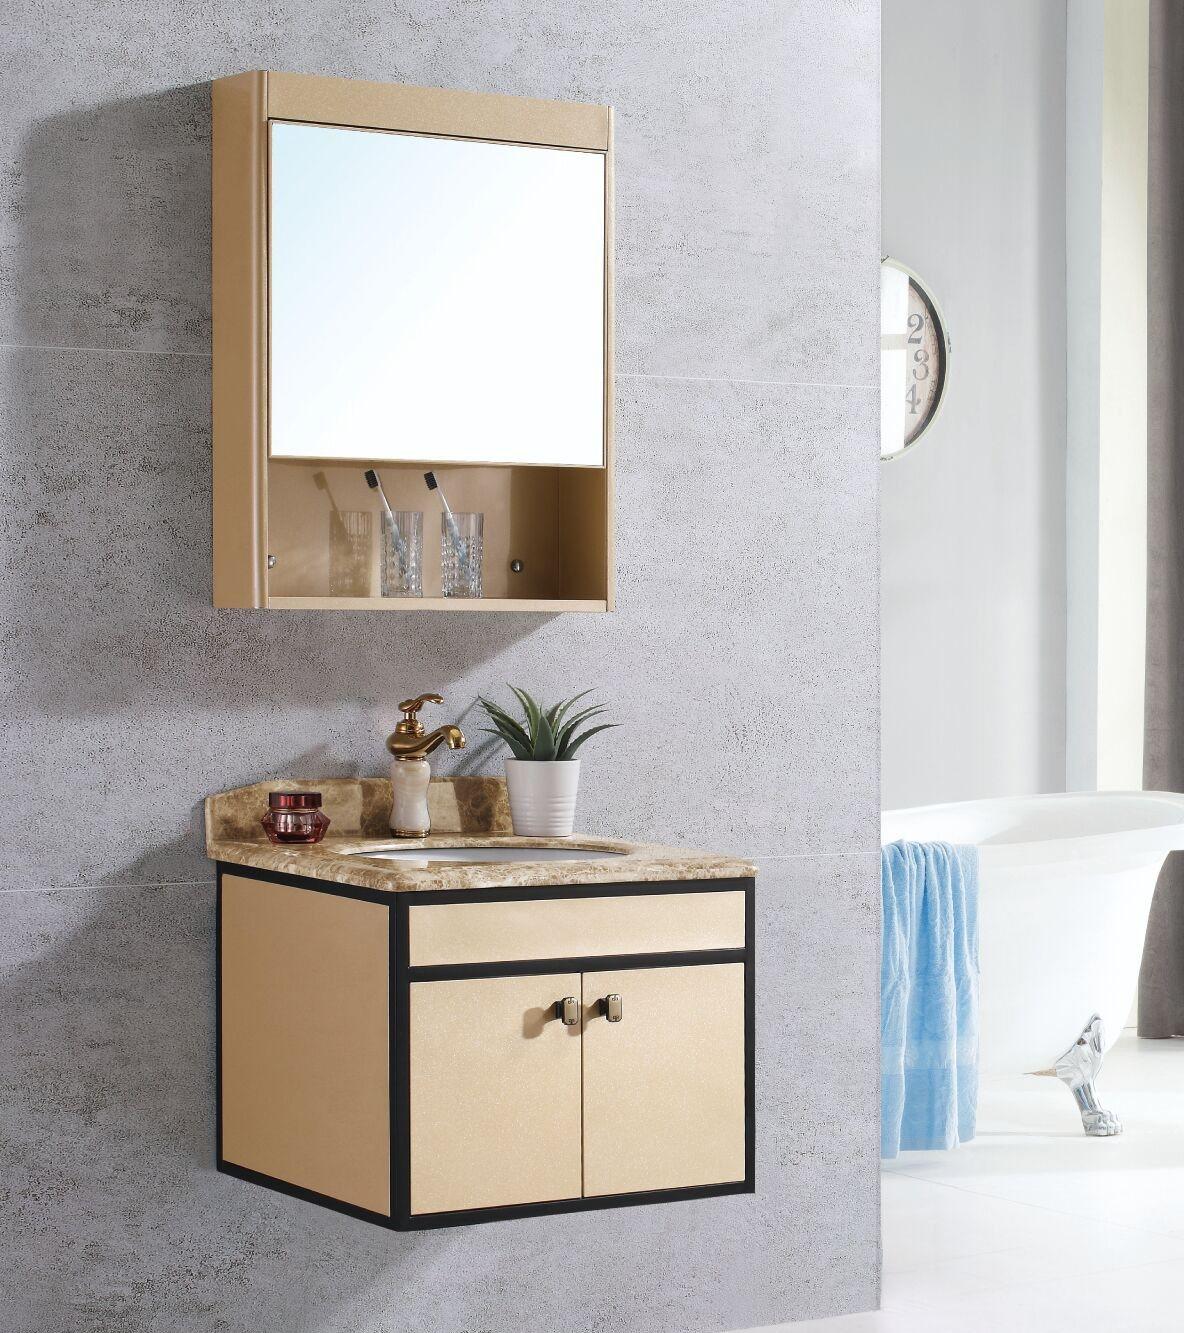 China Hot Sale Good Quality Bathroom Furniture Cabinet Aluminium Bathroom Vanity Cabinet As 1136 China Bathroom Cabinet Bathroom Vanity